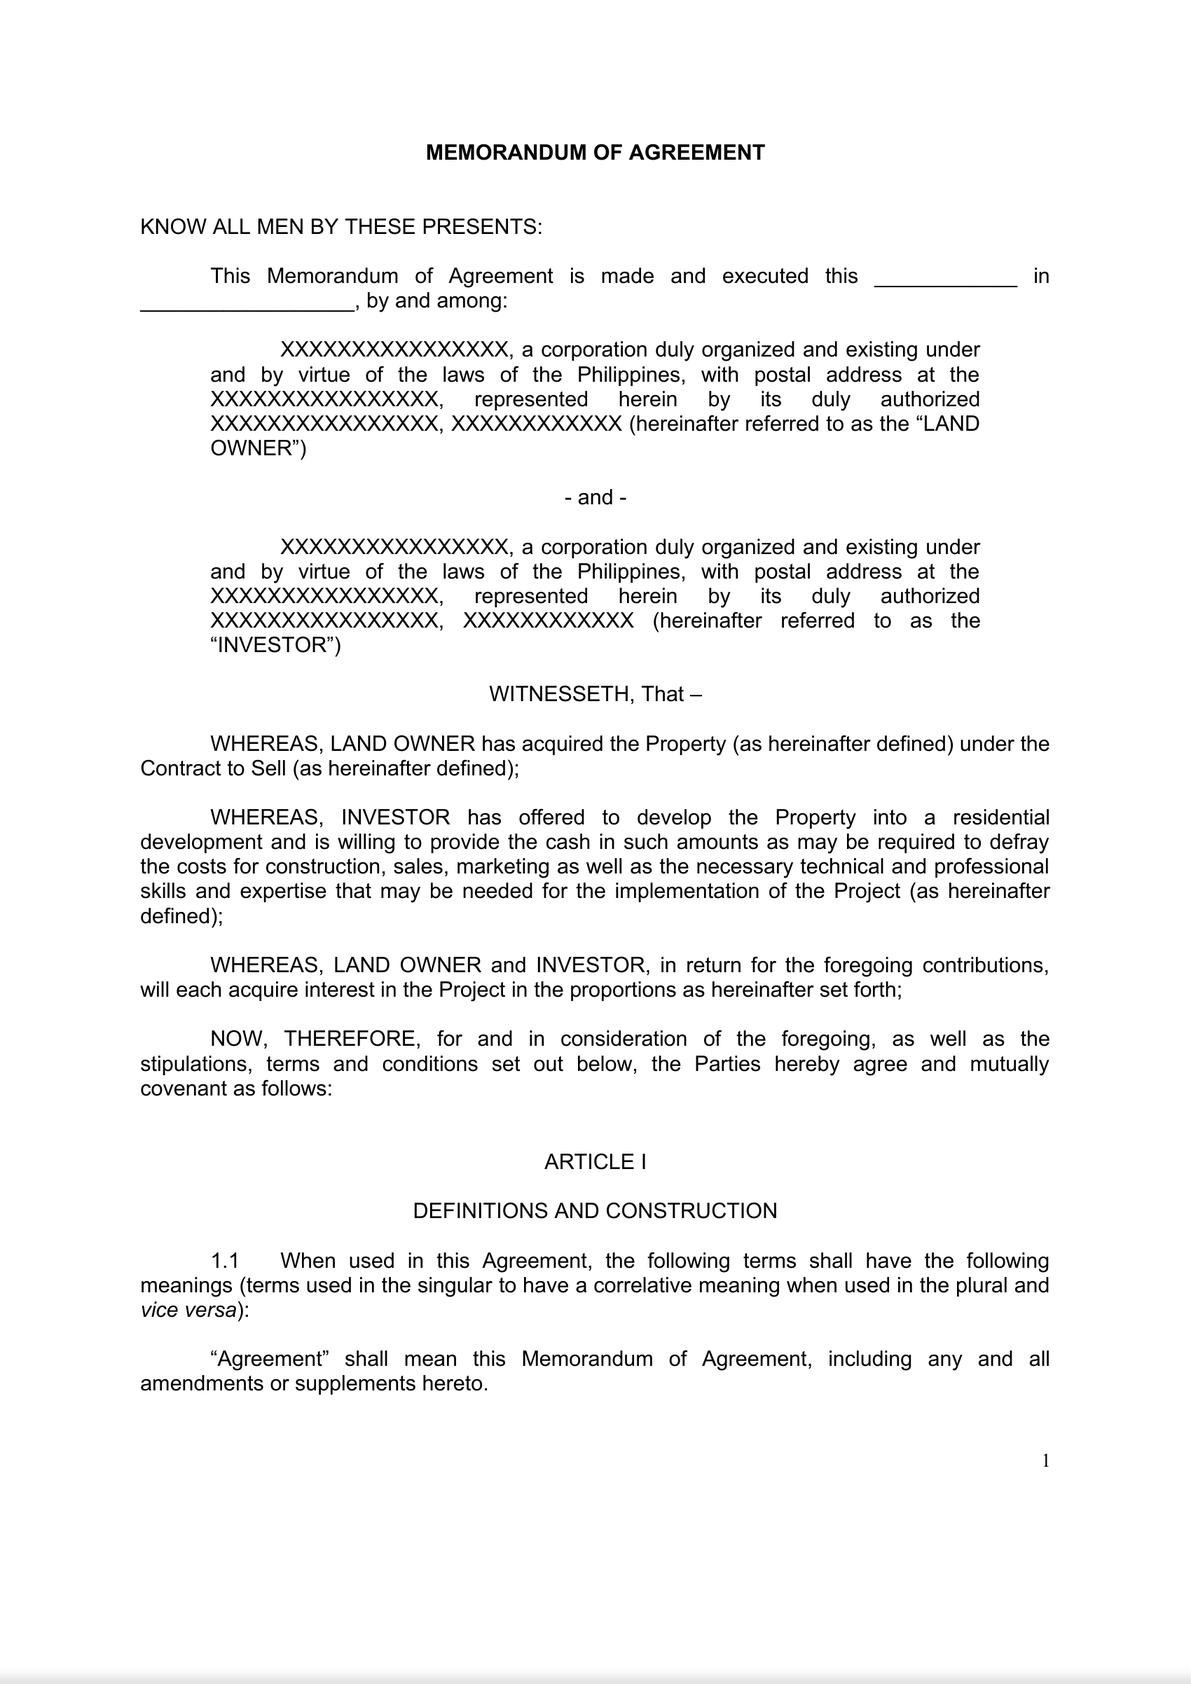 Memorandum of Agreement - Property Development-0